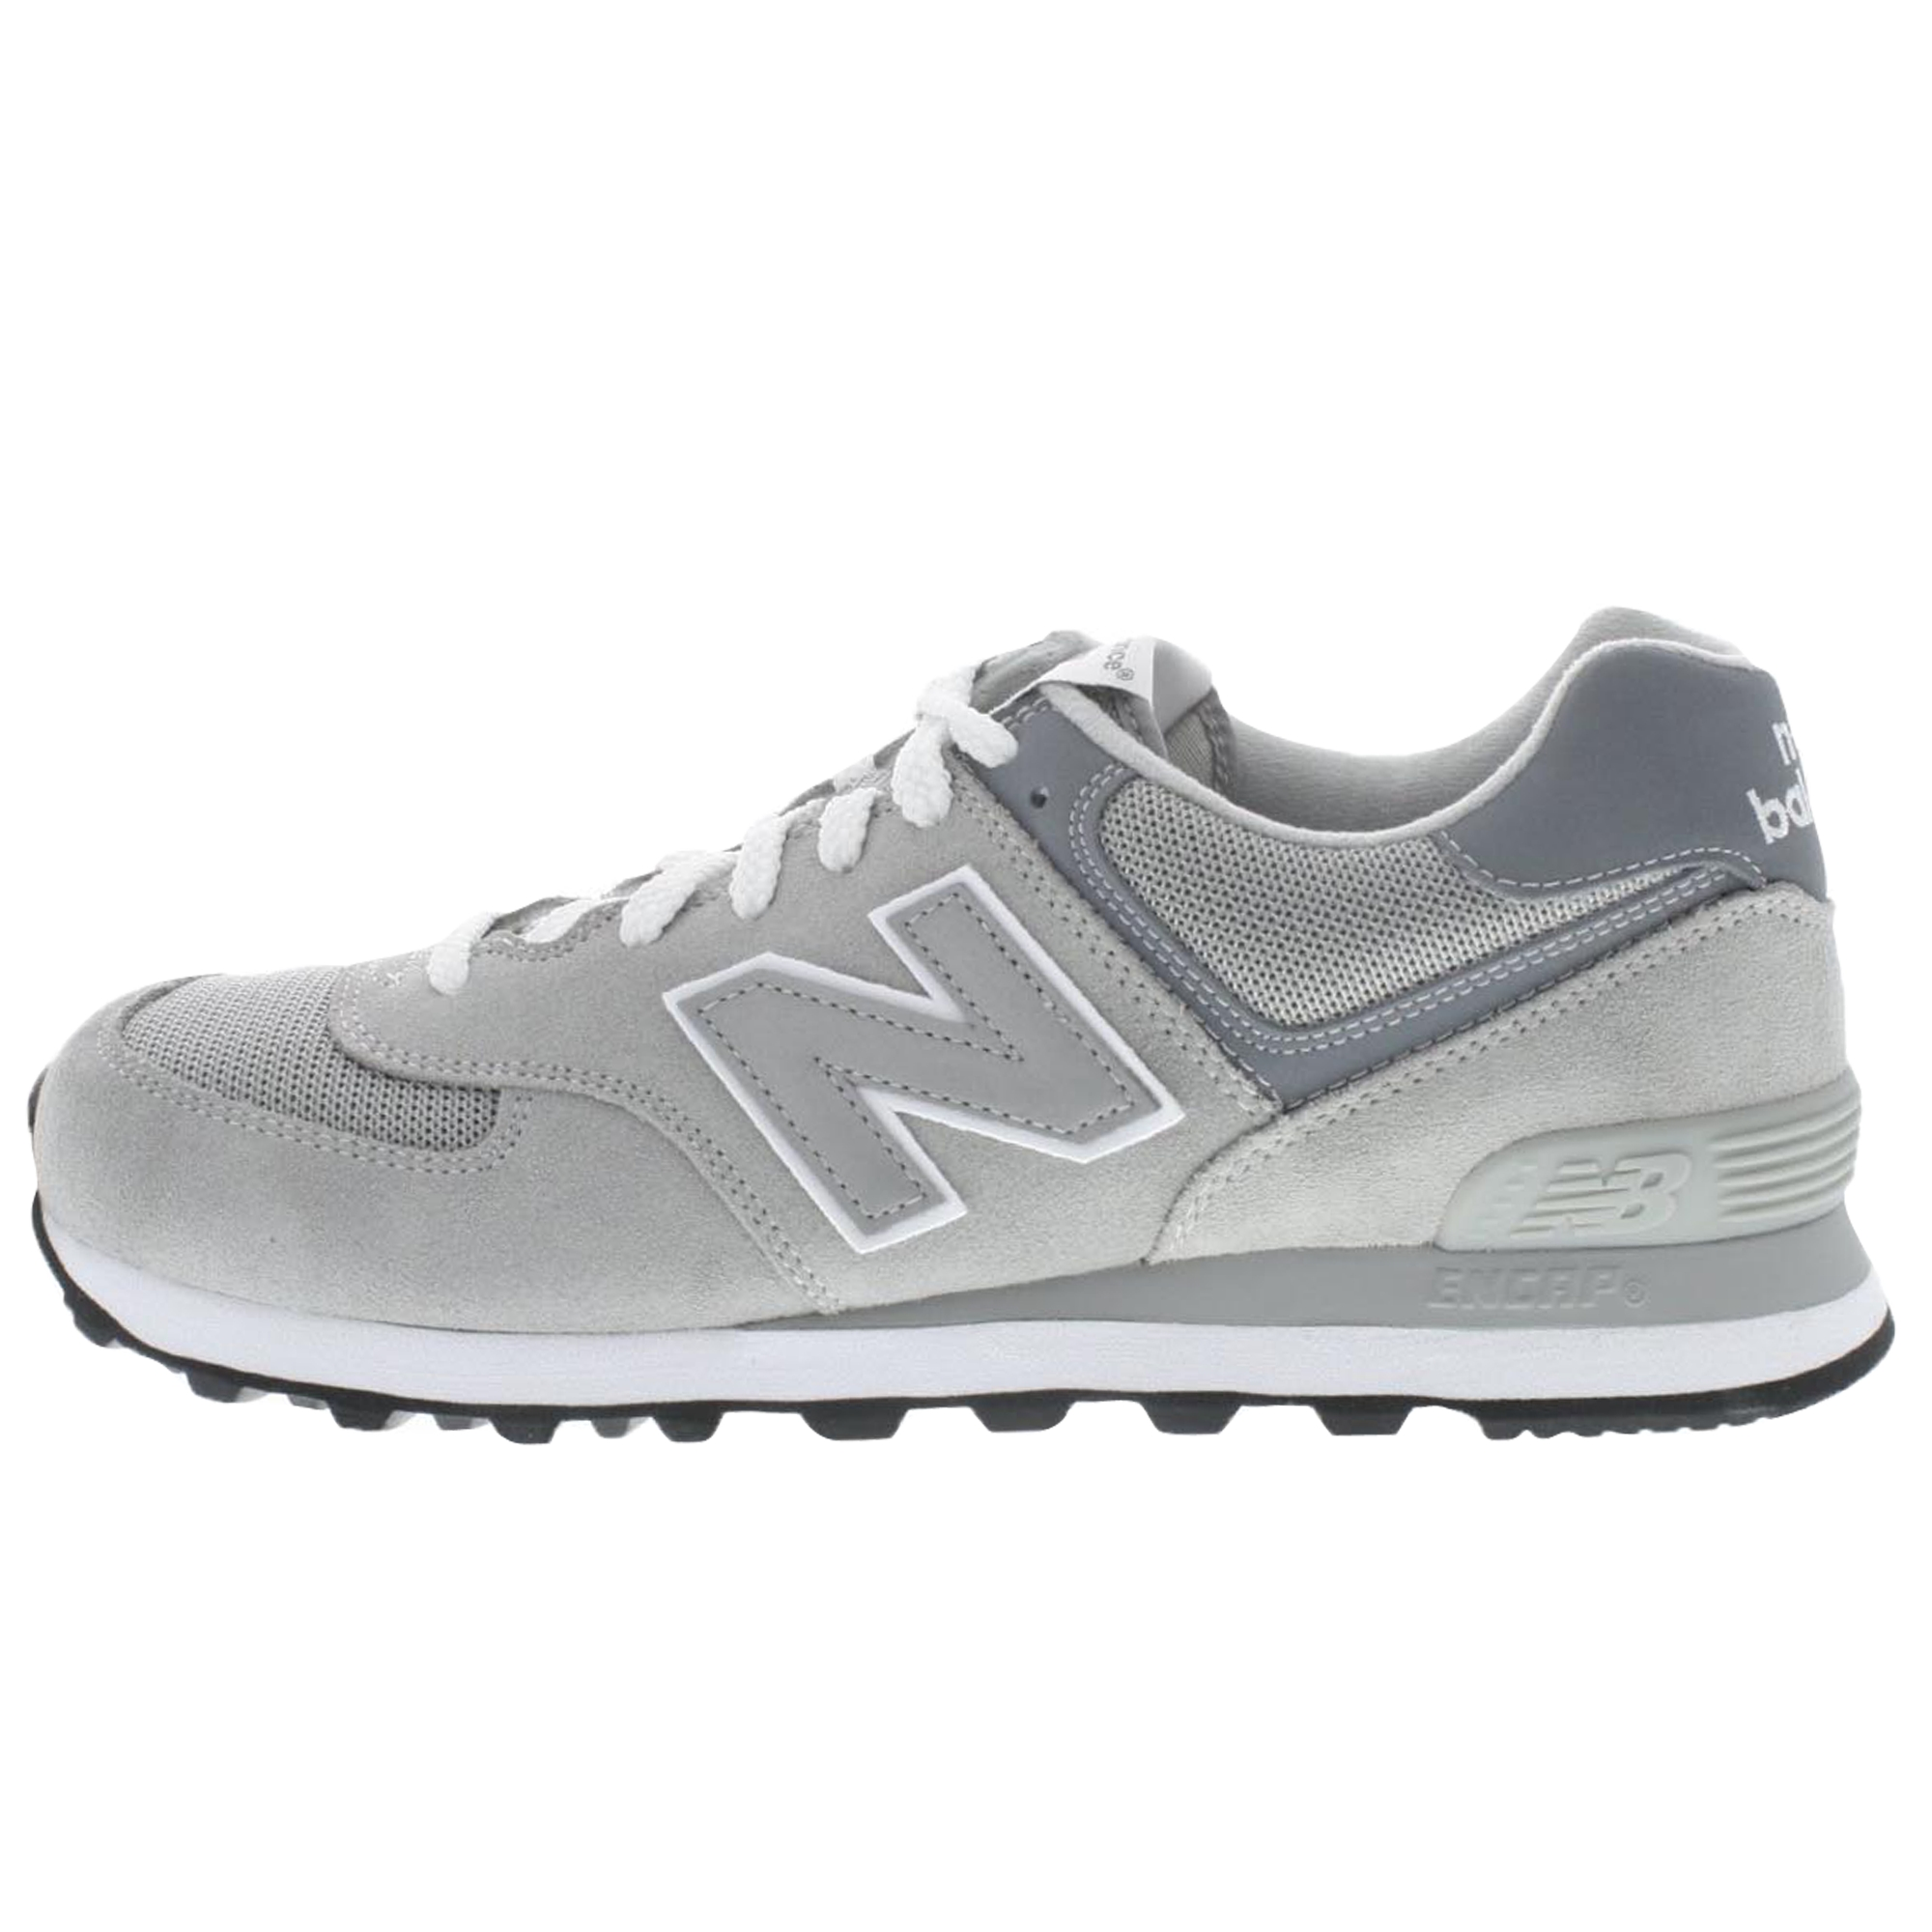 ... new balance erkek outdoor ayakkabi ...